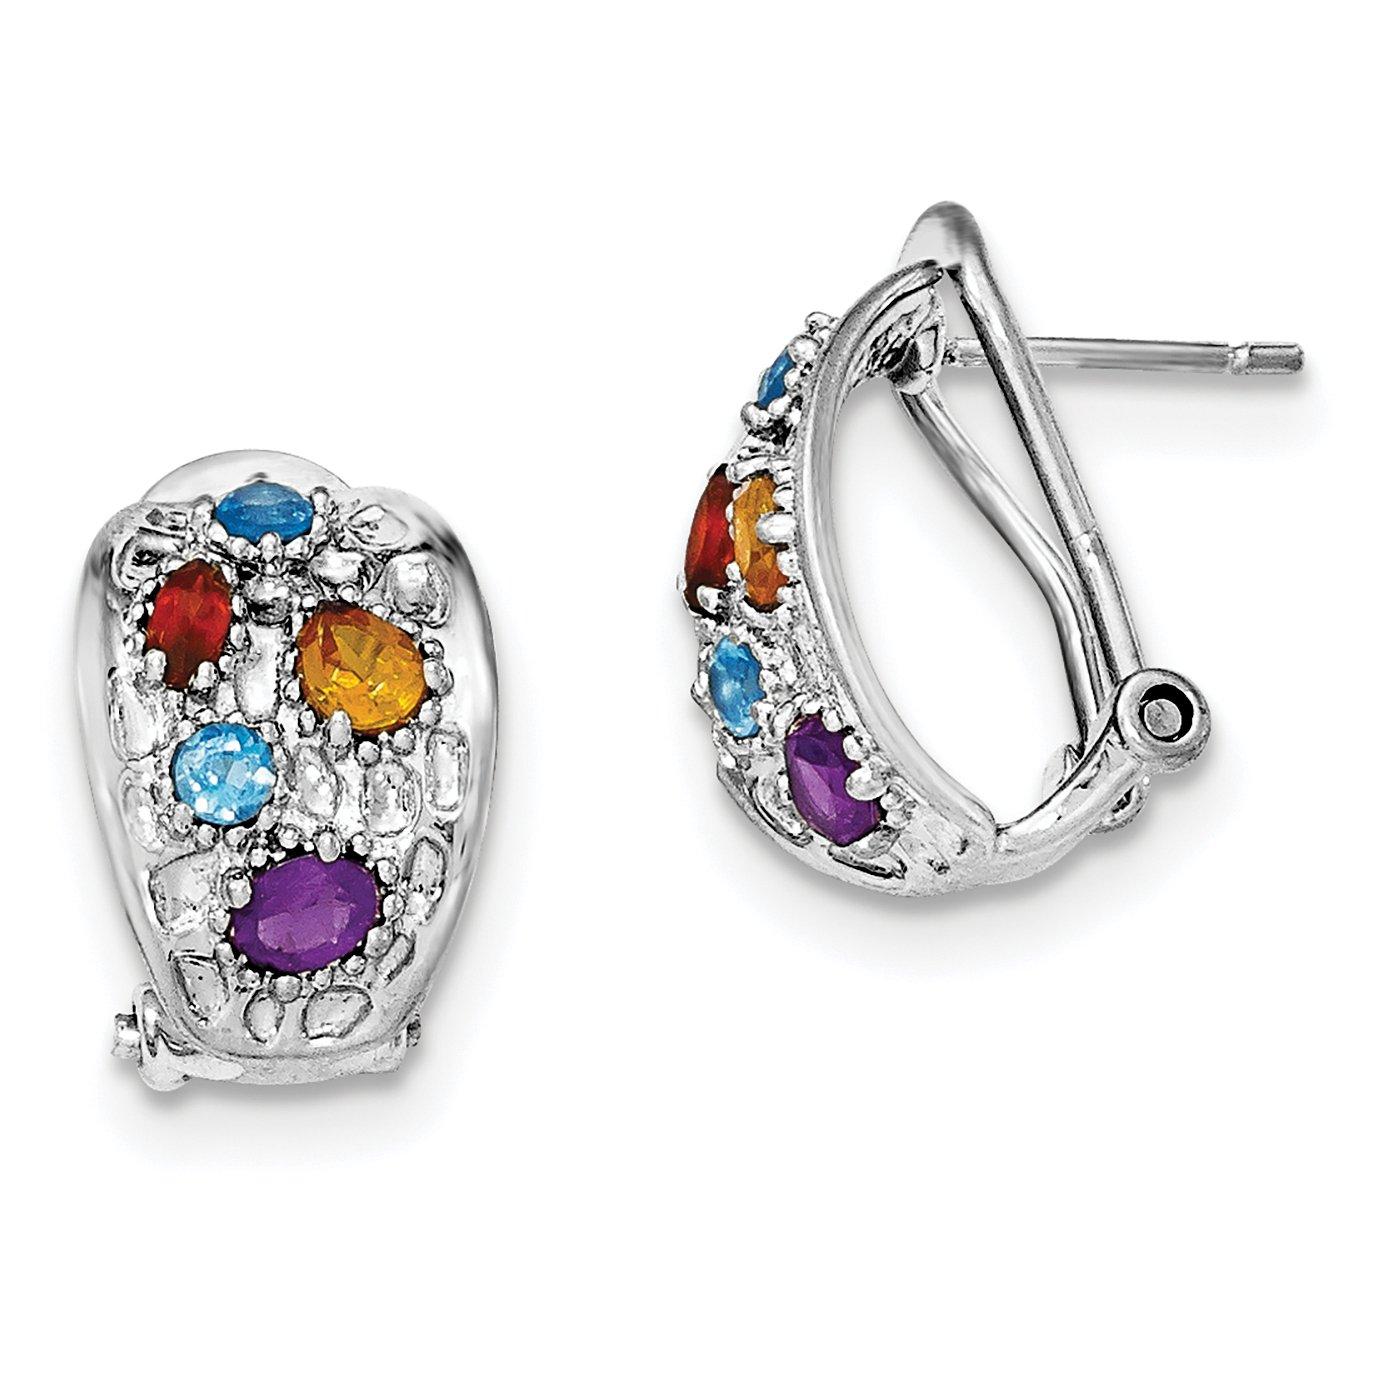 ICE CARATS 925 Sterling Silver Amethyst/blue Topaz/garnet/citrine Omega Back Leverback Ball Button Stud Earrings Lever Fine Jewelry Gift Set For Women Heart